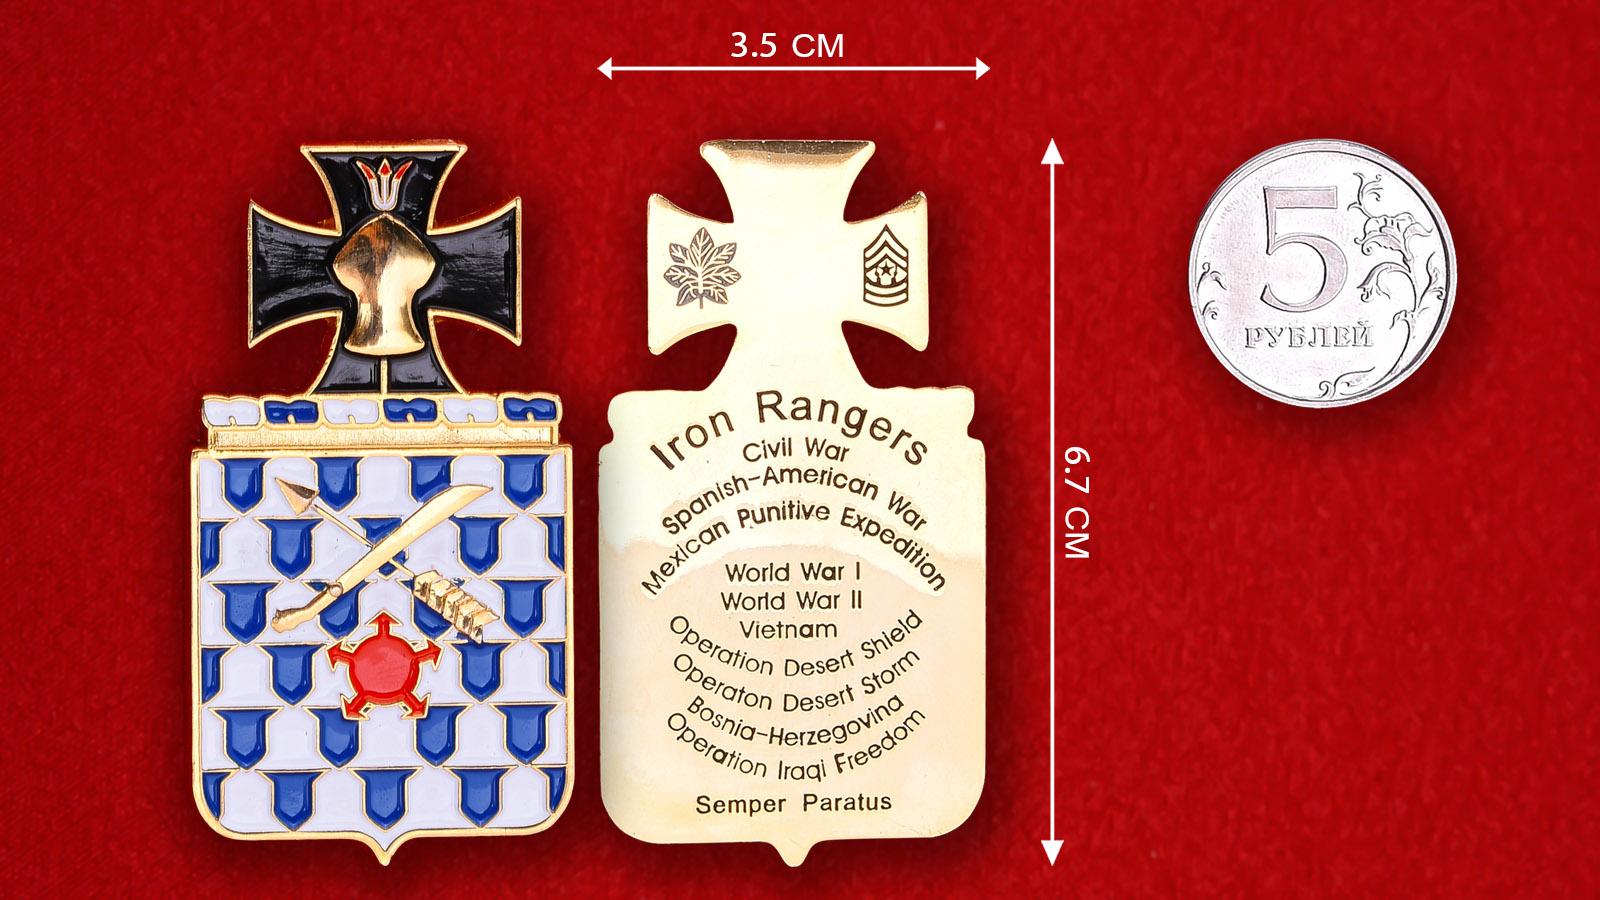 Челлендж коин 16-го пехотного полка армии США